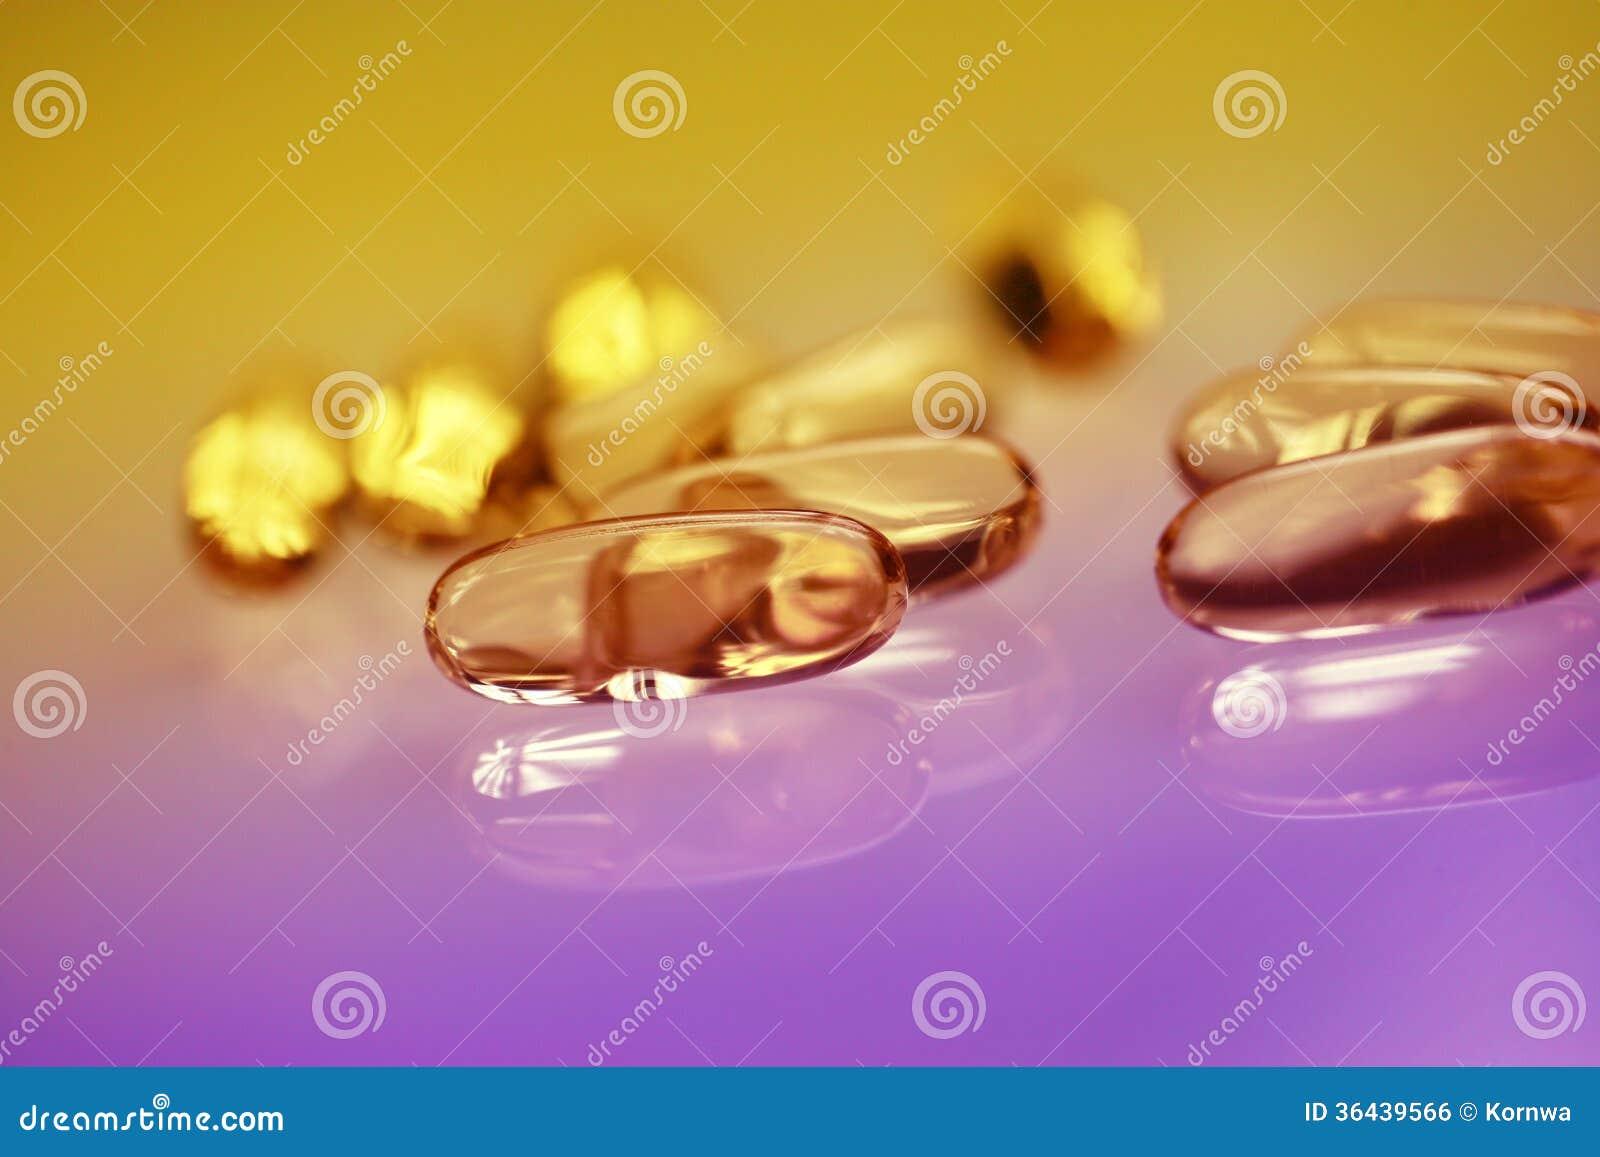 Drogas o vitaminas